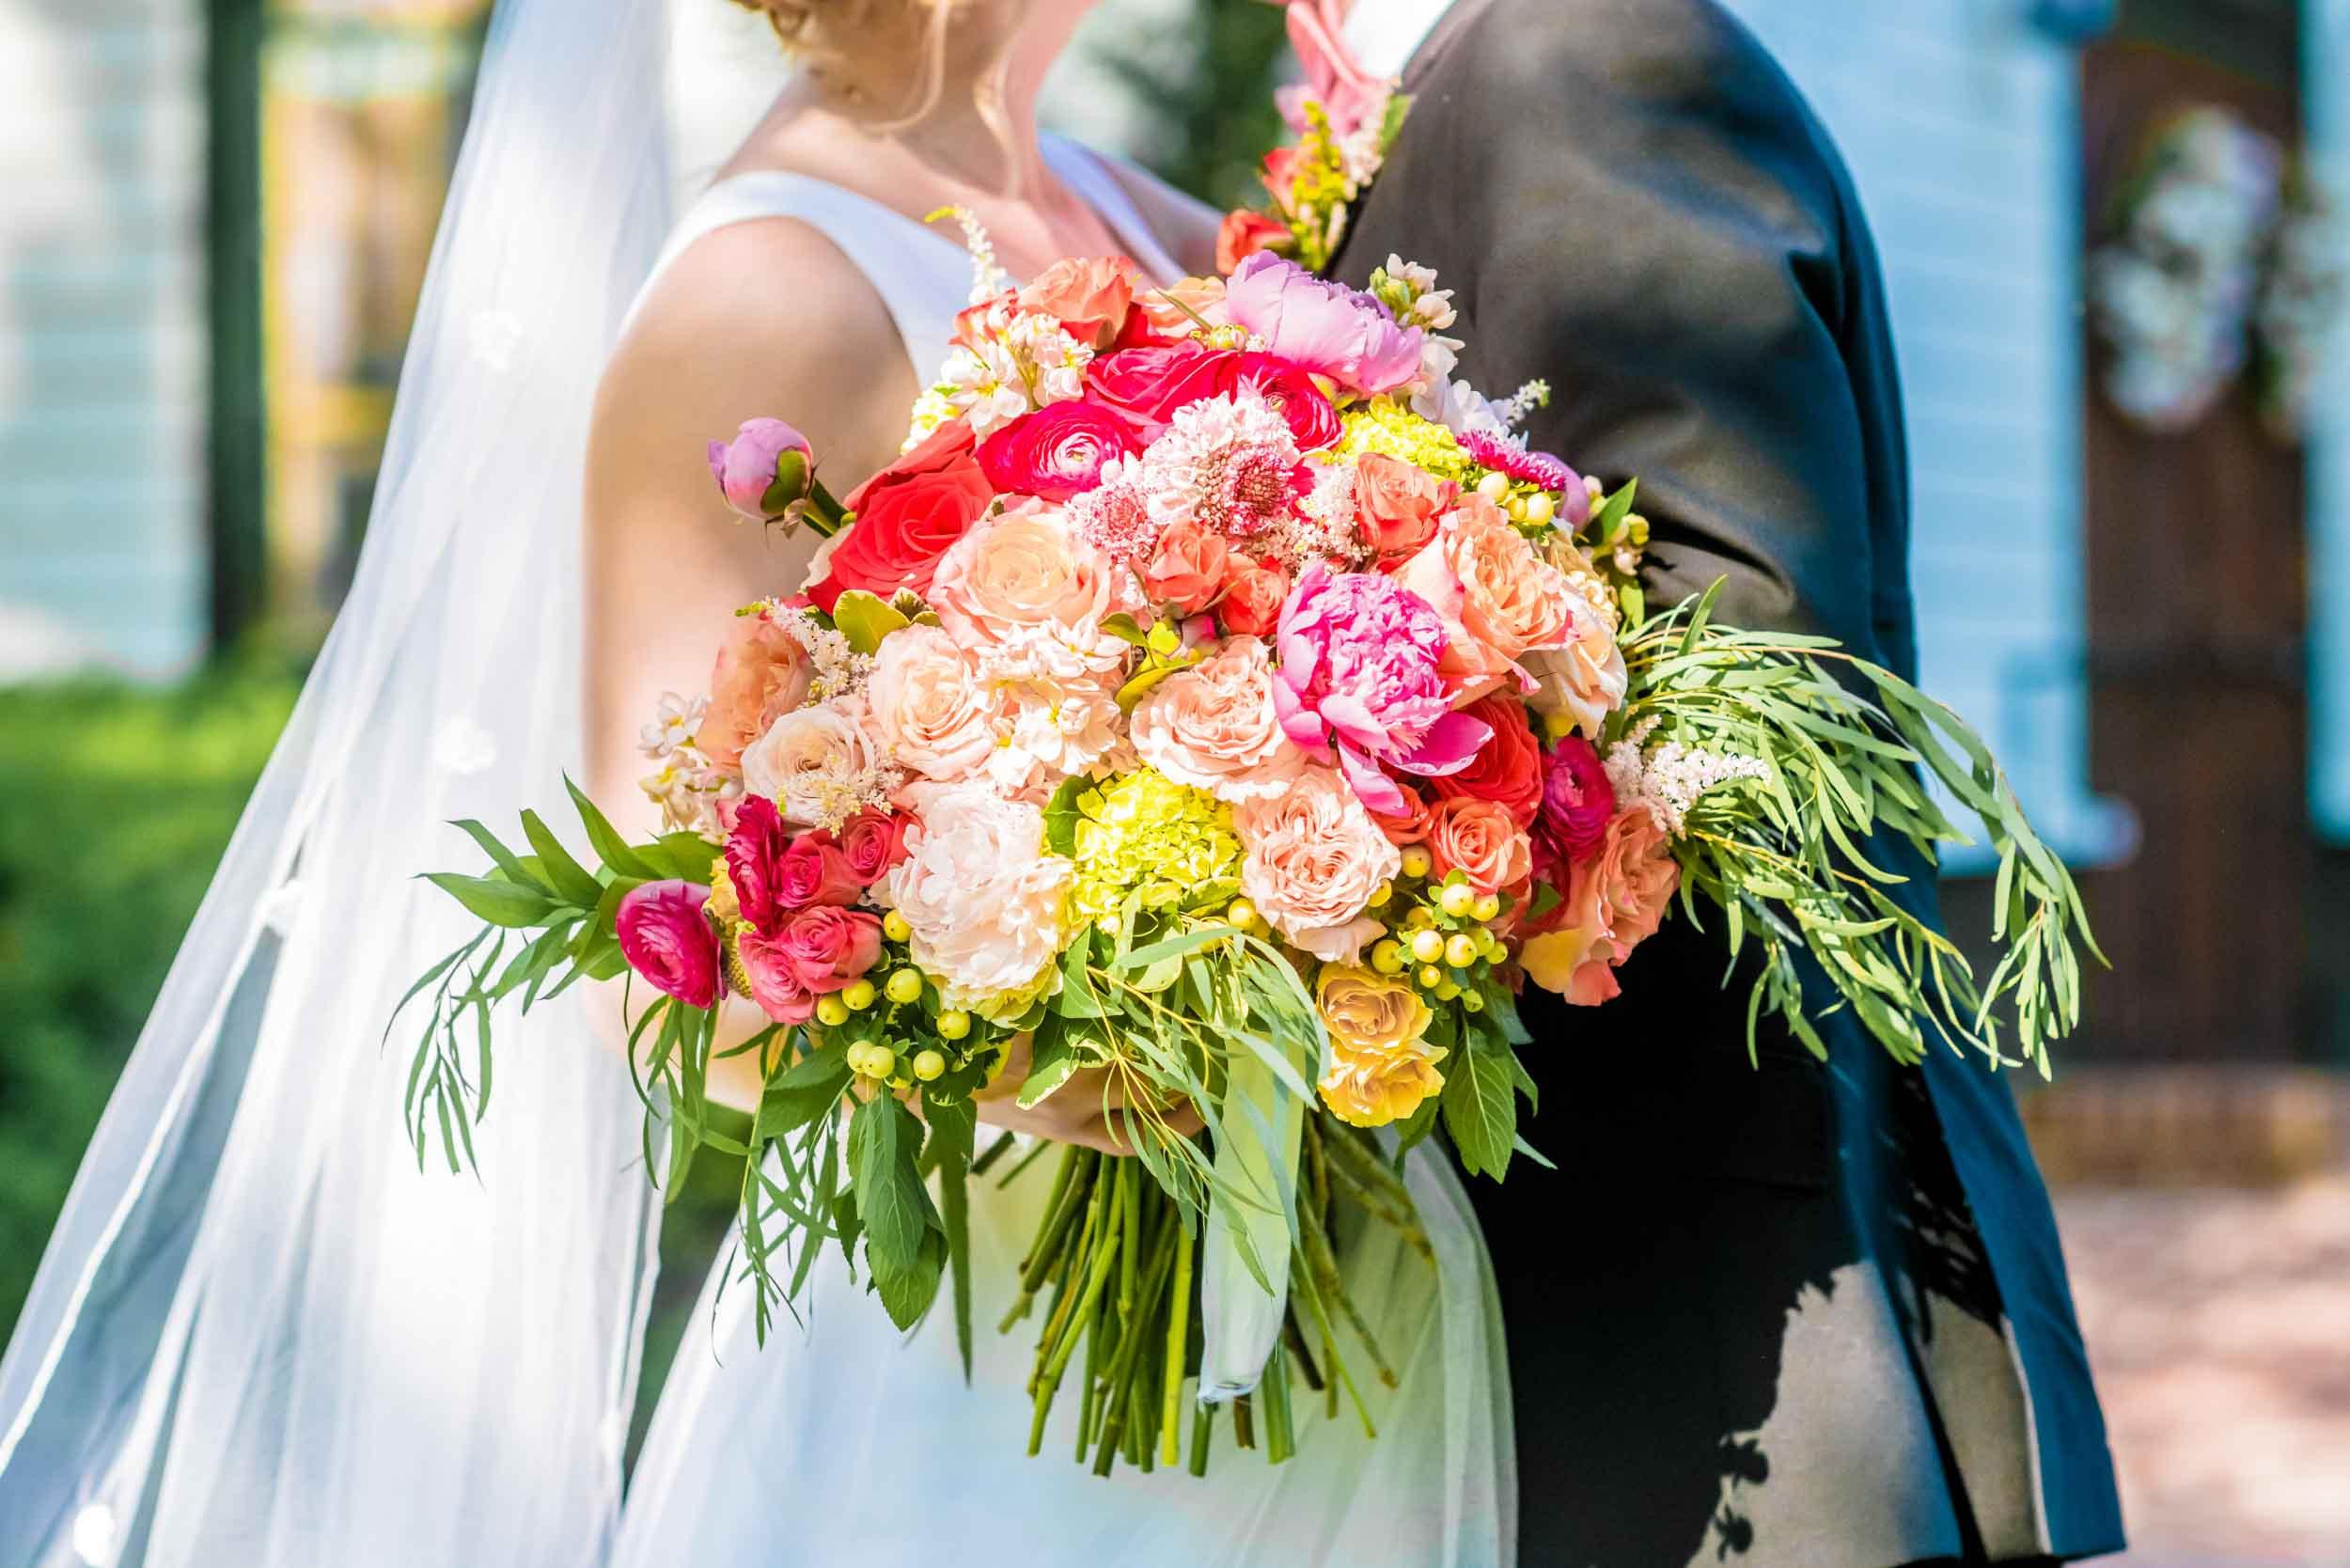 dc+metro+wedding+photographer+vadym+guliuk+photography+wedding+flowers-2022.jpg